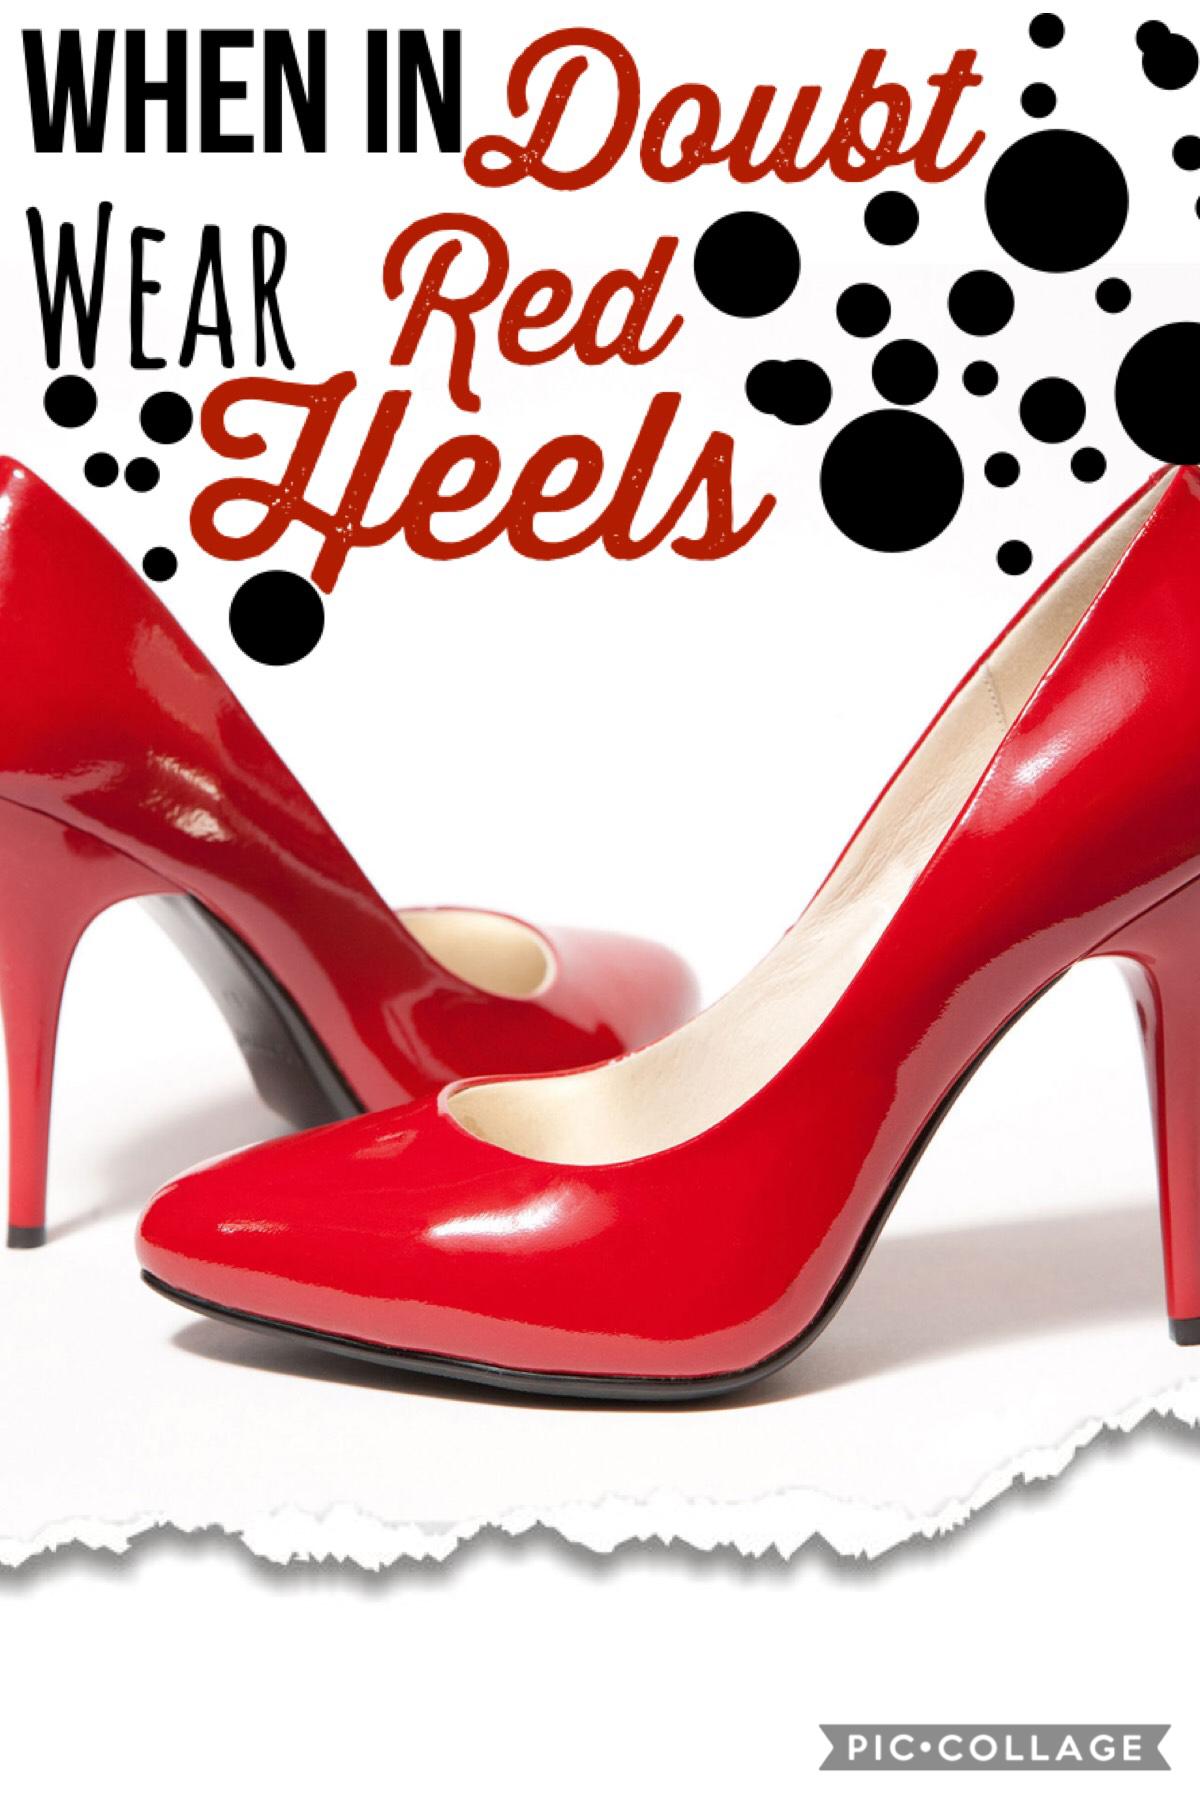 Tappy   Yasss! Red heeeeells!!